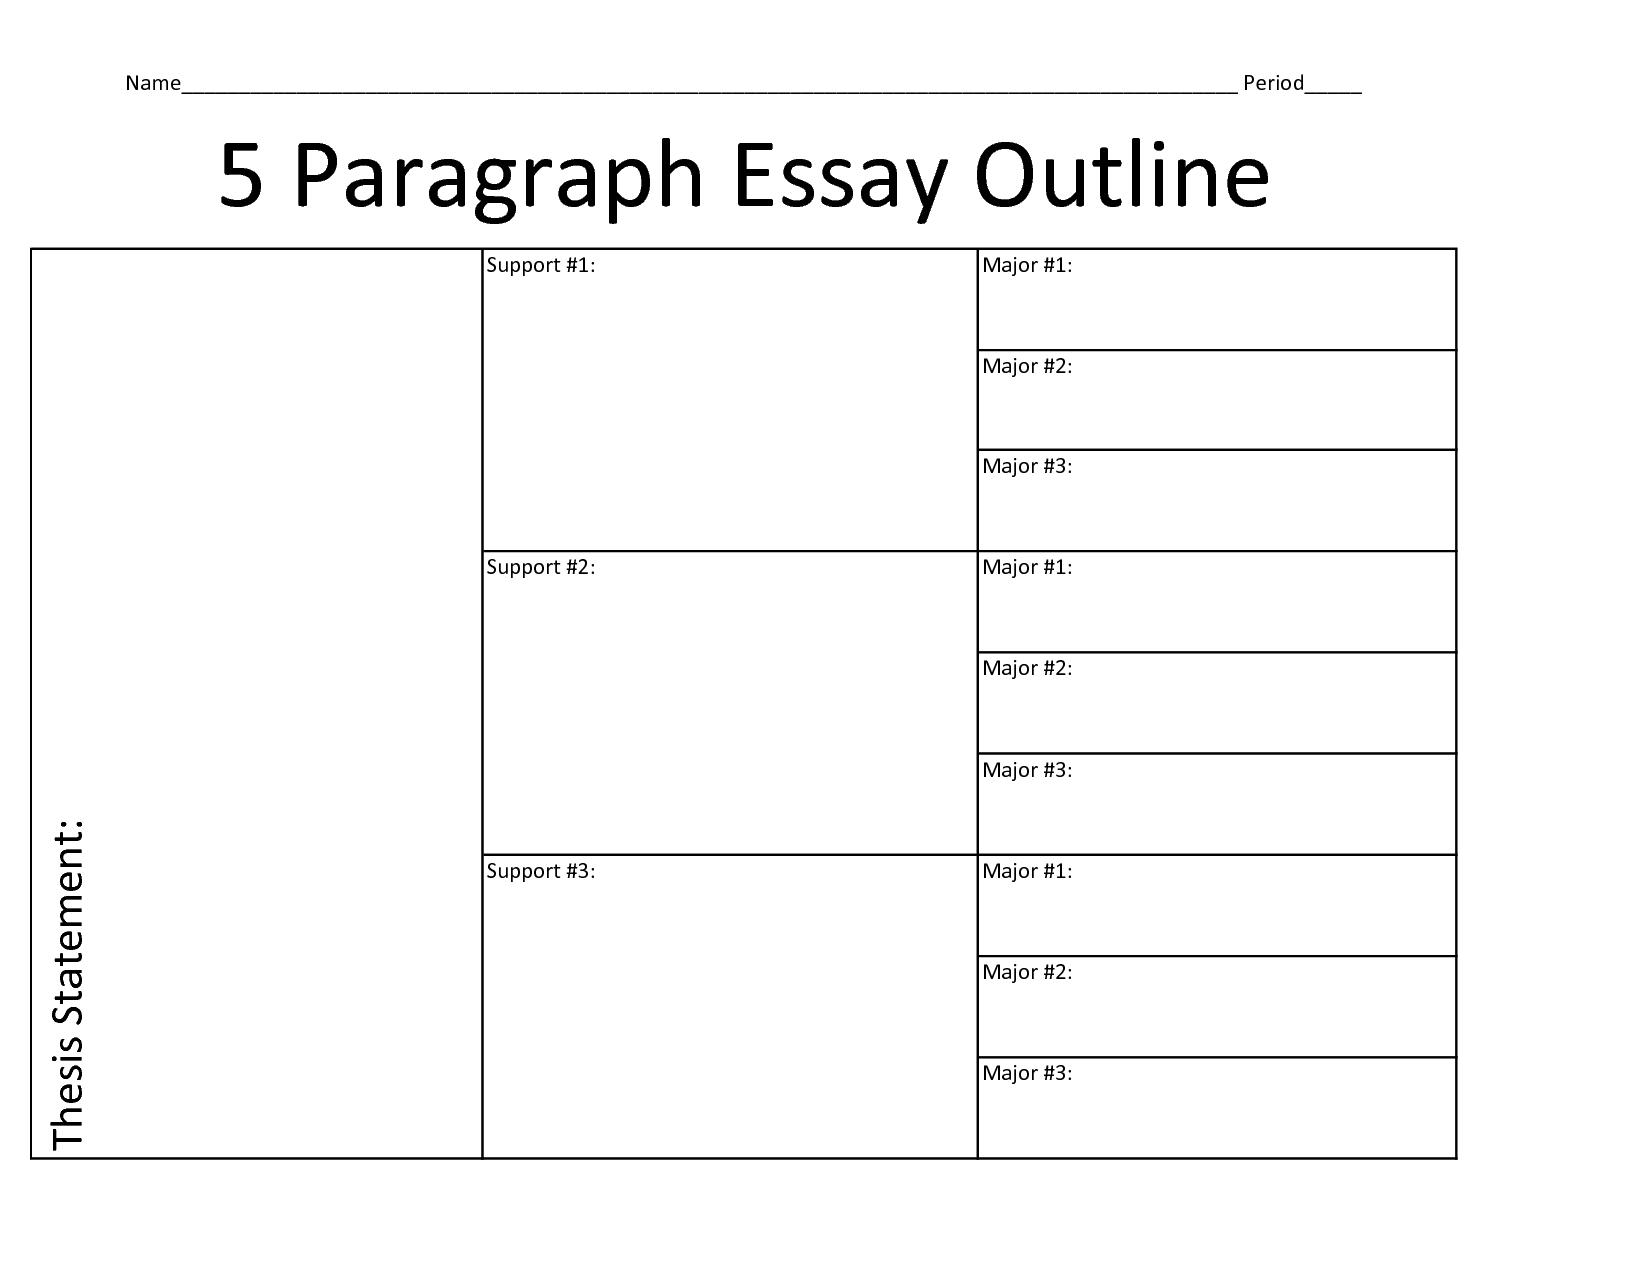 015 Five Paragraph Essay Graphic Organizer Organizers Executive Functioning Mr Brown039s Outline L Wonderful 5 Middle School Pdf Organizer-hamburger Full